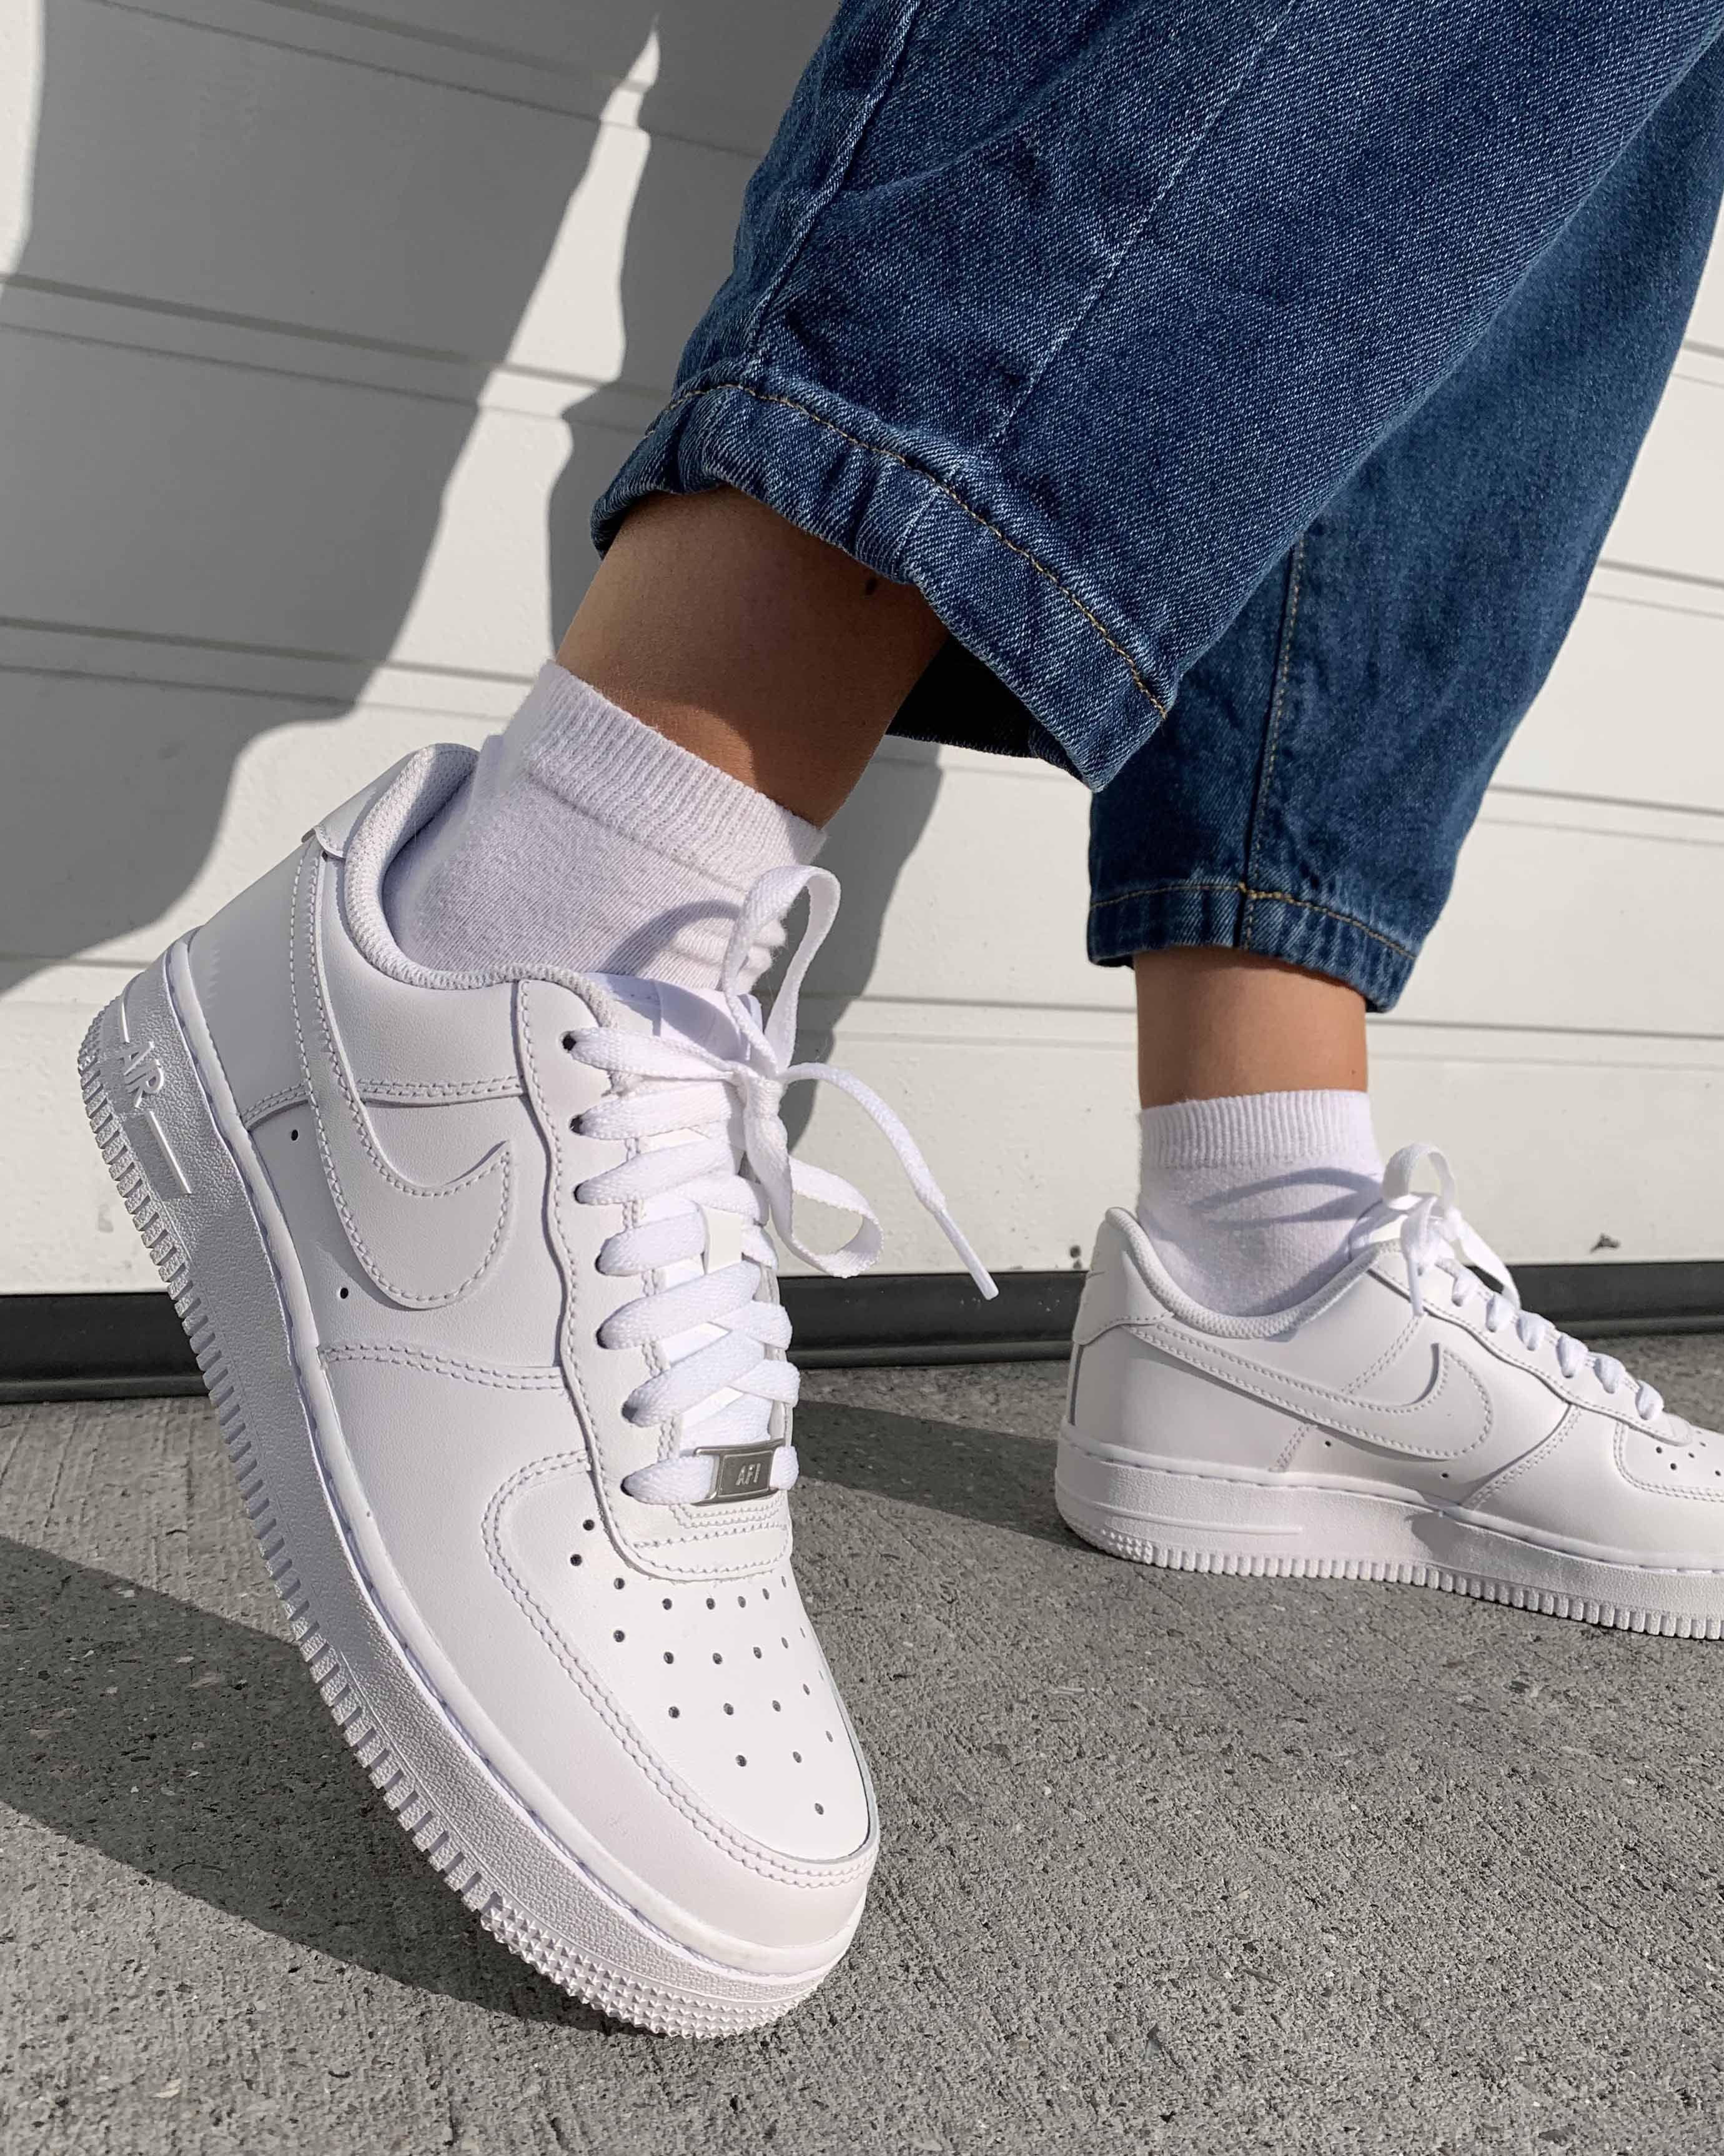 nike wmns air force 1 '07 zapatillas de basquetbol